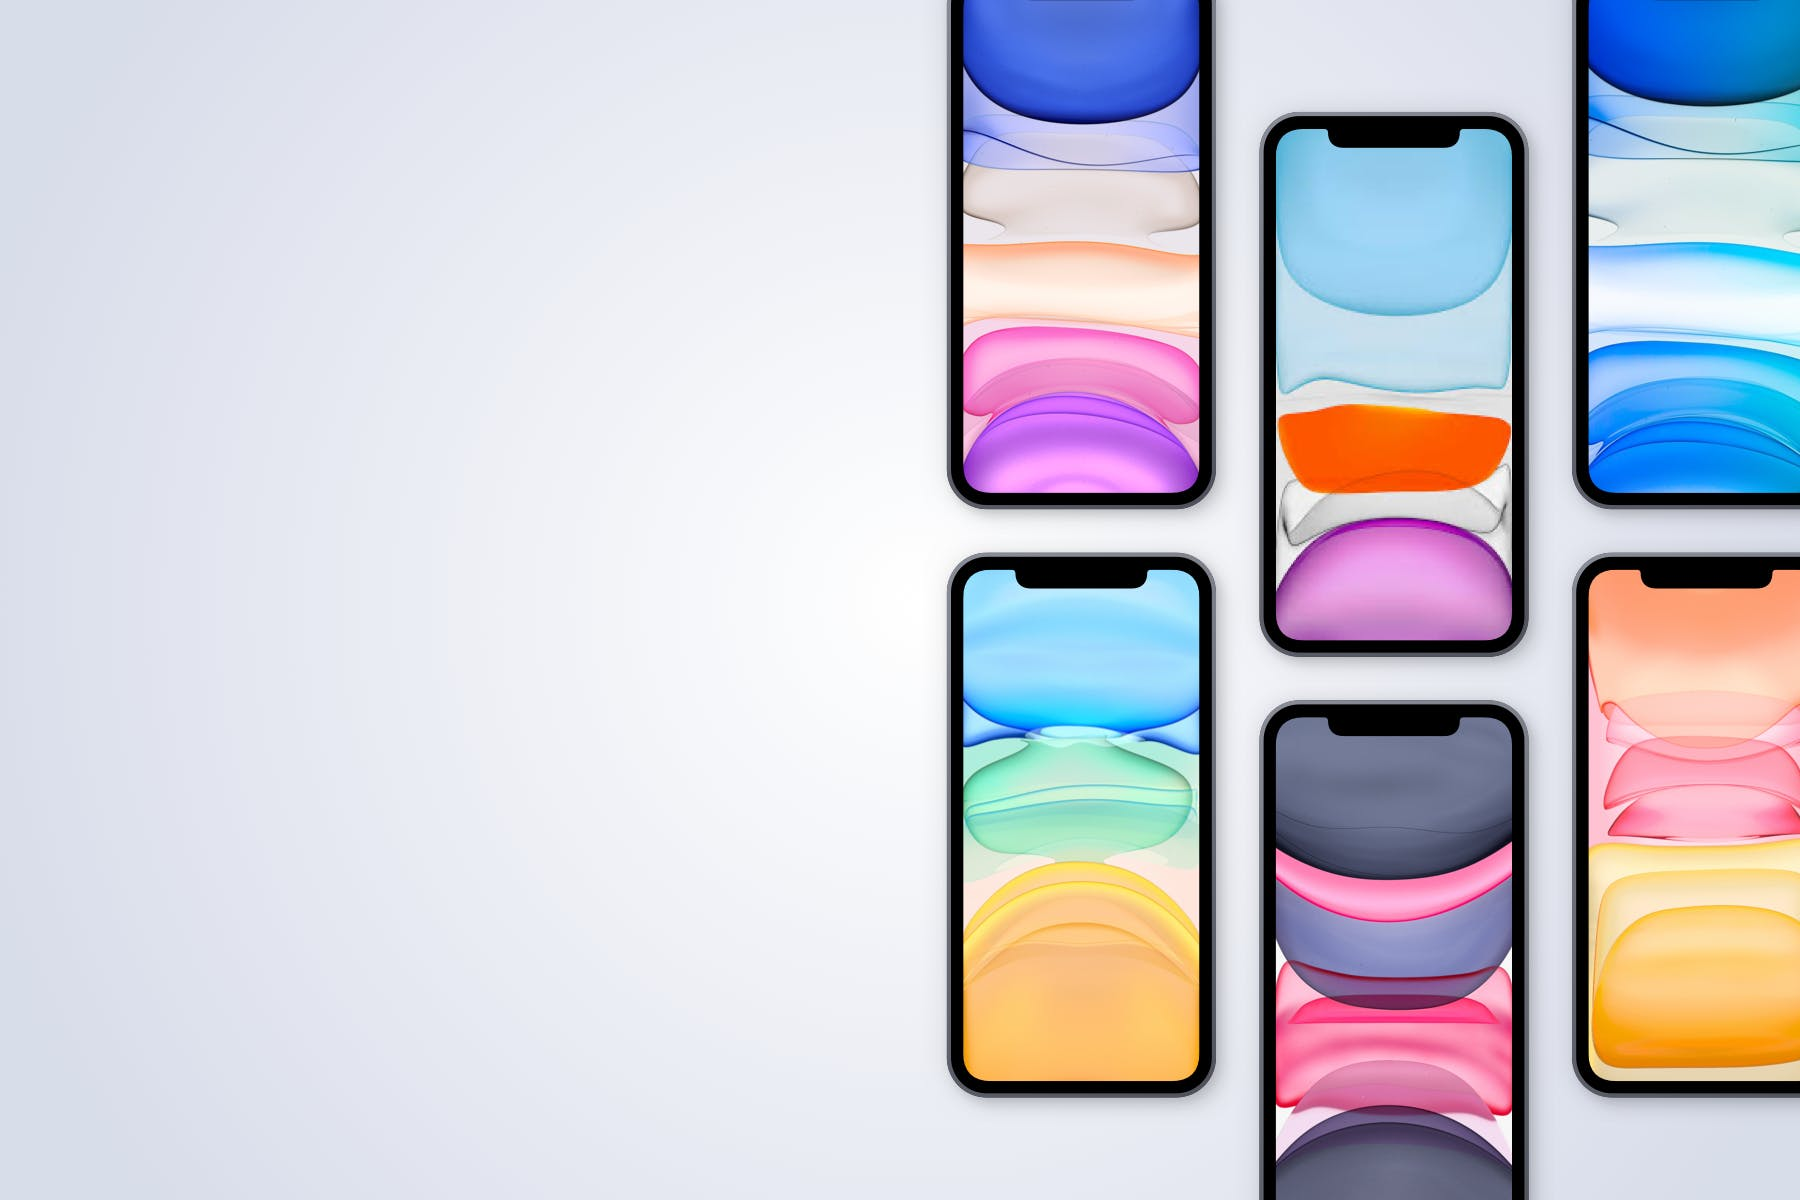 逼真苹果手机iPhone 12 Pro屏幕演示样机Sketch模板素材 iPhone 12 Pro – Sketch Mockup – 4 Different Scenes插图4